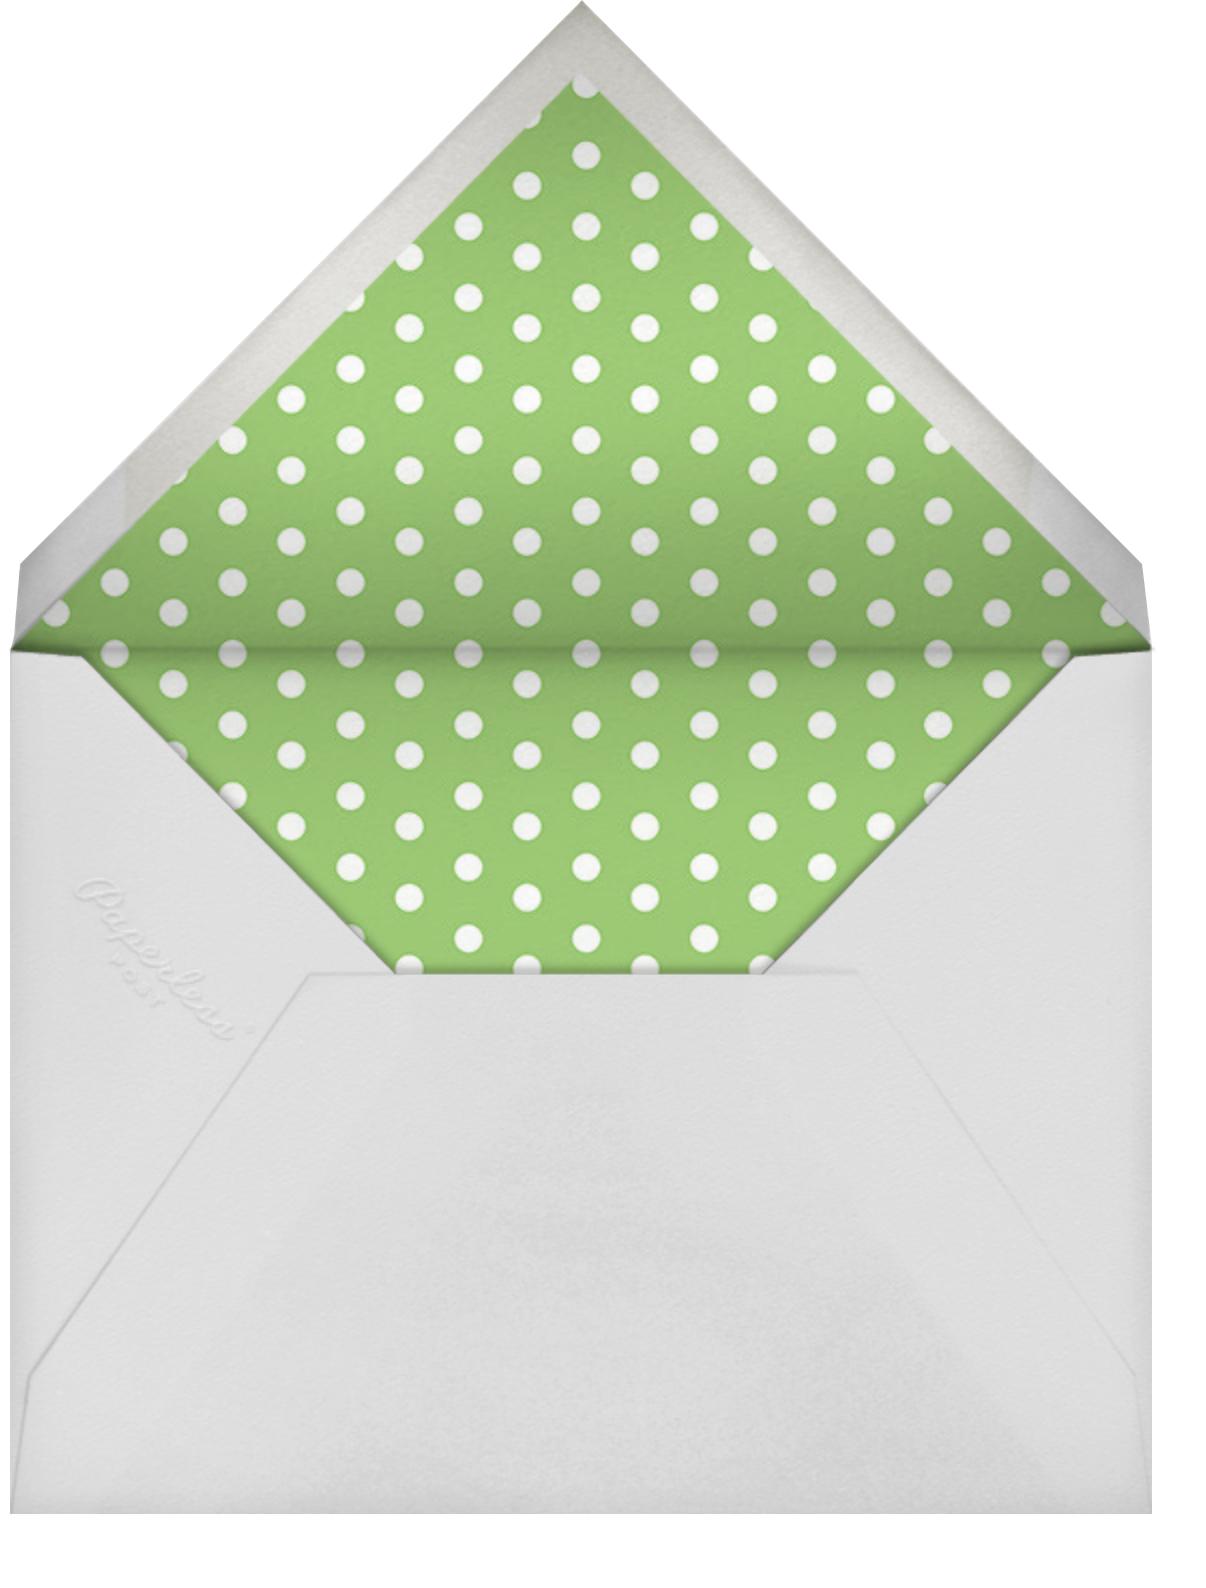 Animal House - Rifle Paper Co. - Woodland baby shower invitations - envelope back